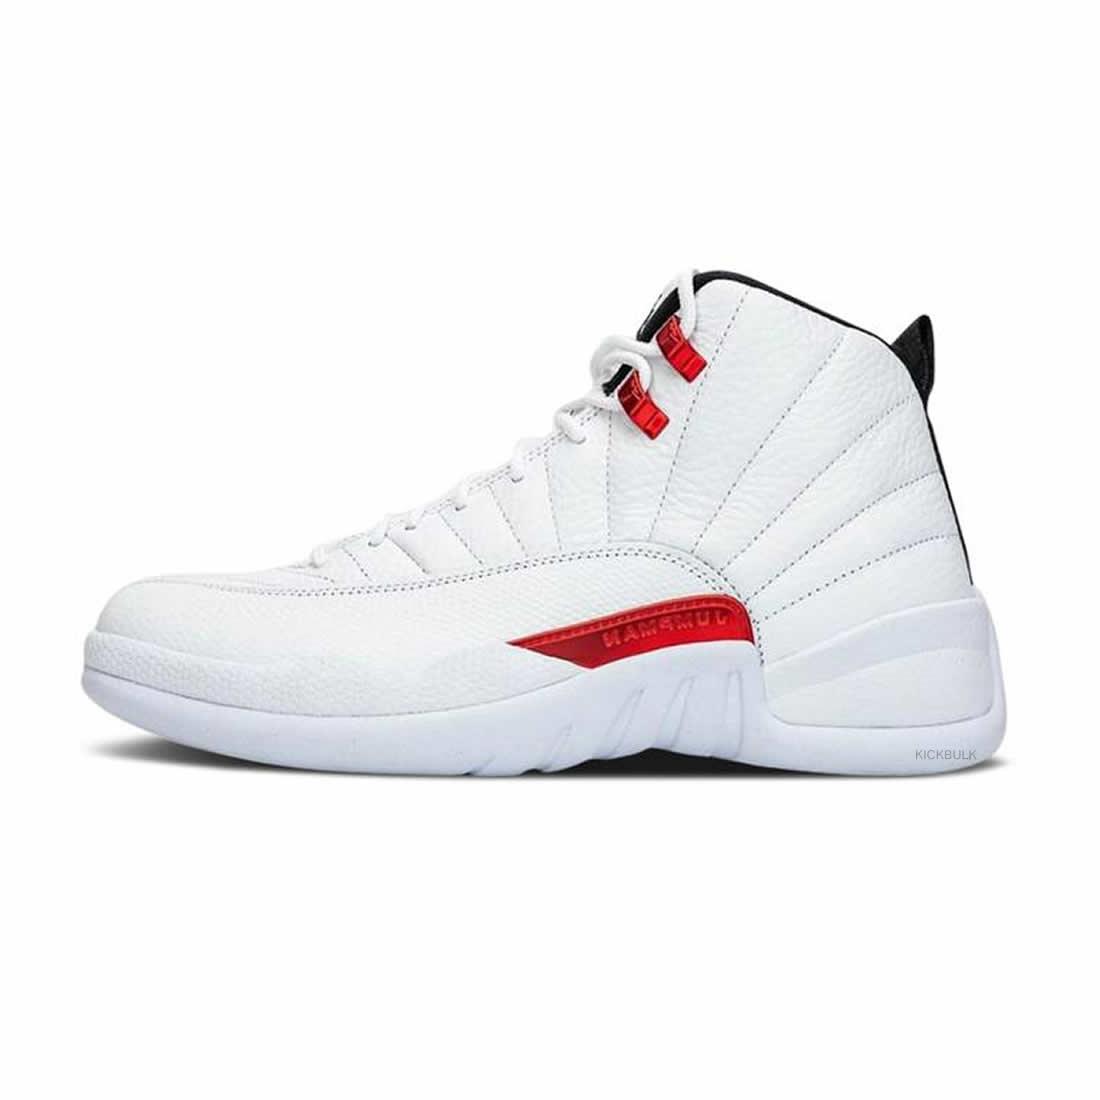 Nike Air Jordan 12 Retro Twist Ct8013 106 1 - www.kickbulk.co